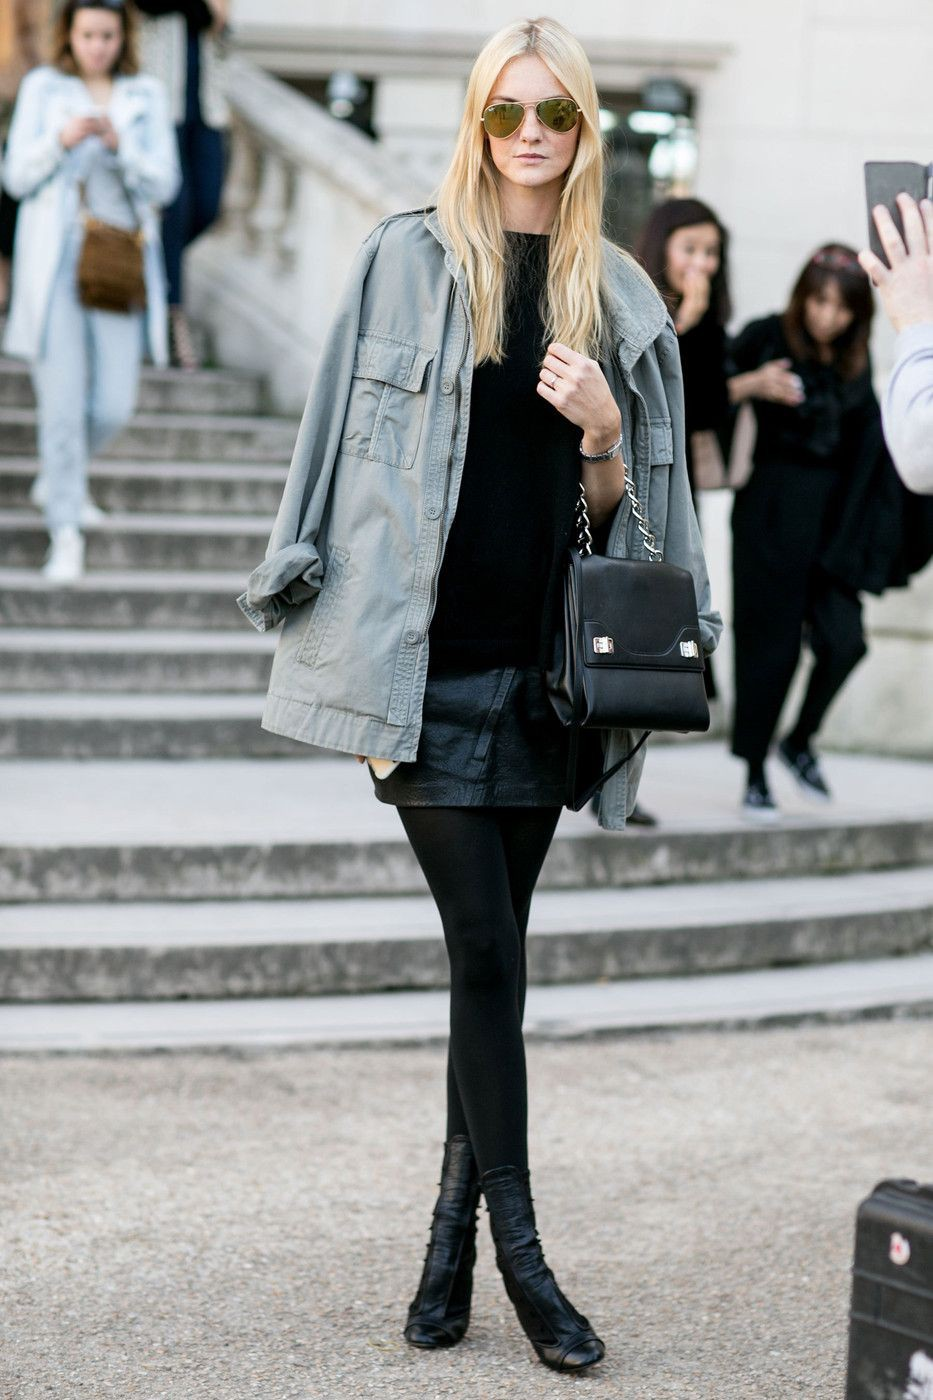 Caroline trentini street style paris fashion week, caroline trentini